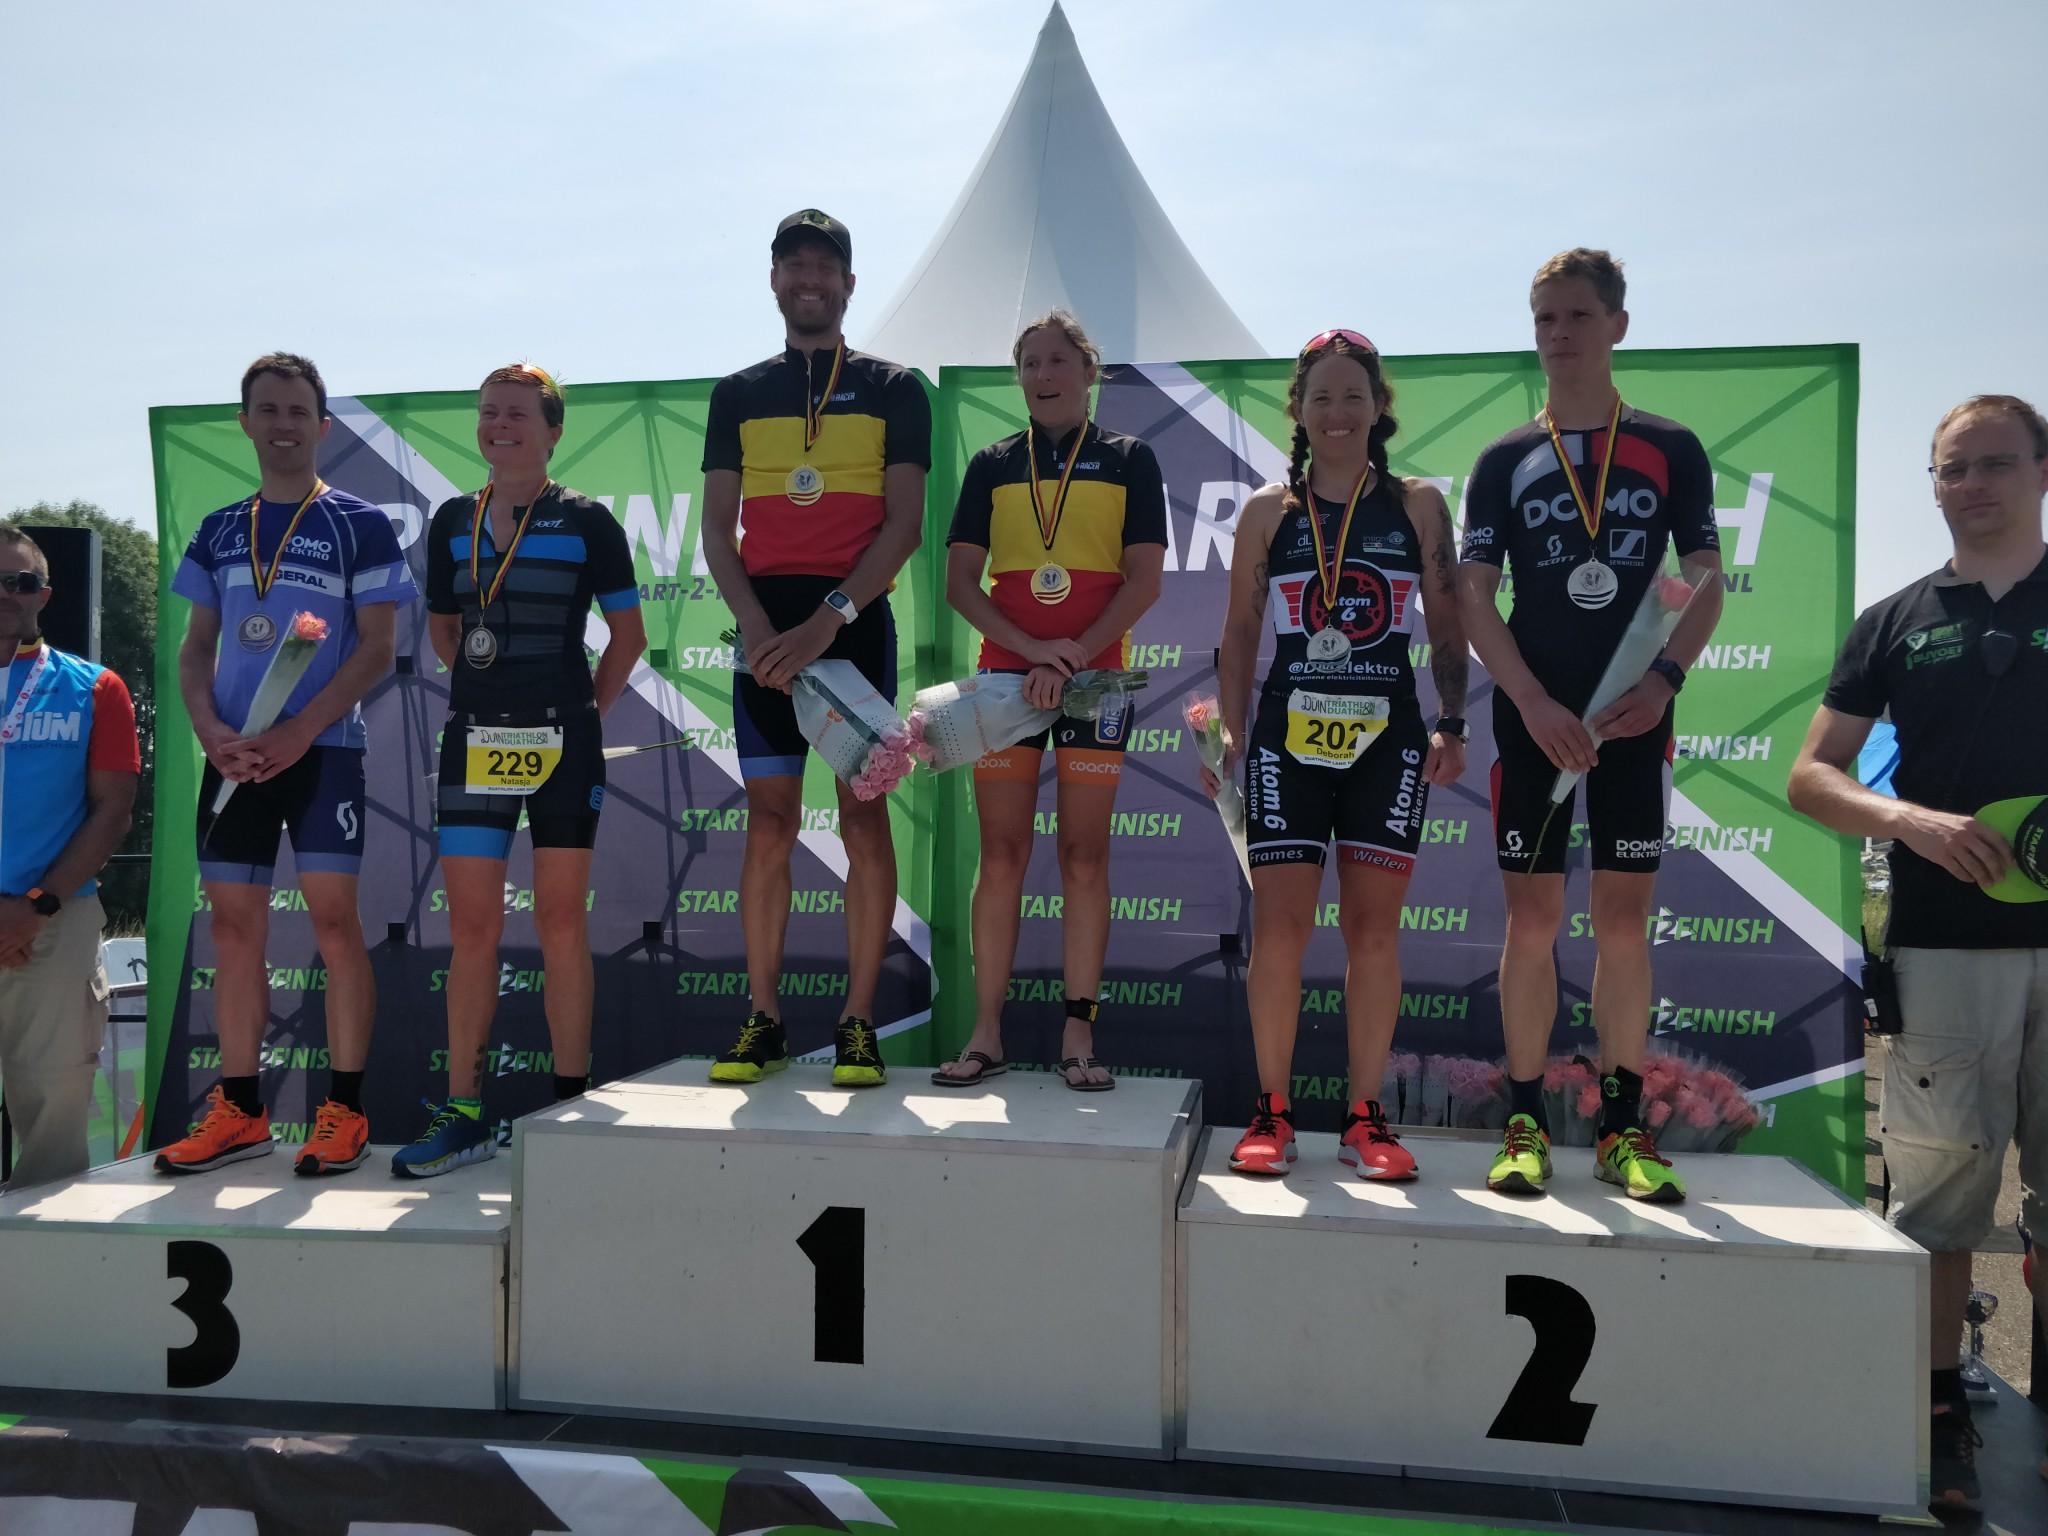 Het BK podium in Almere-Duin (foto: 3athlon.be/Hans Cleemput)